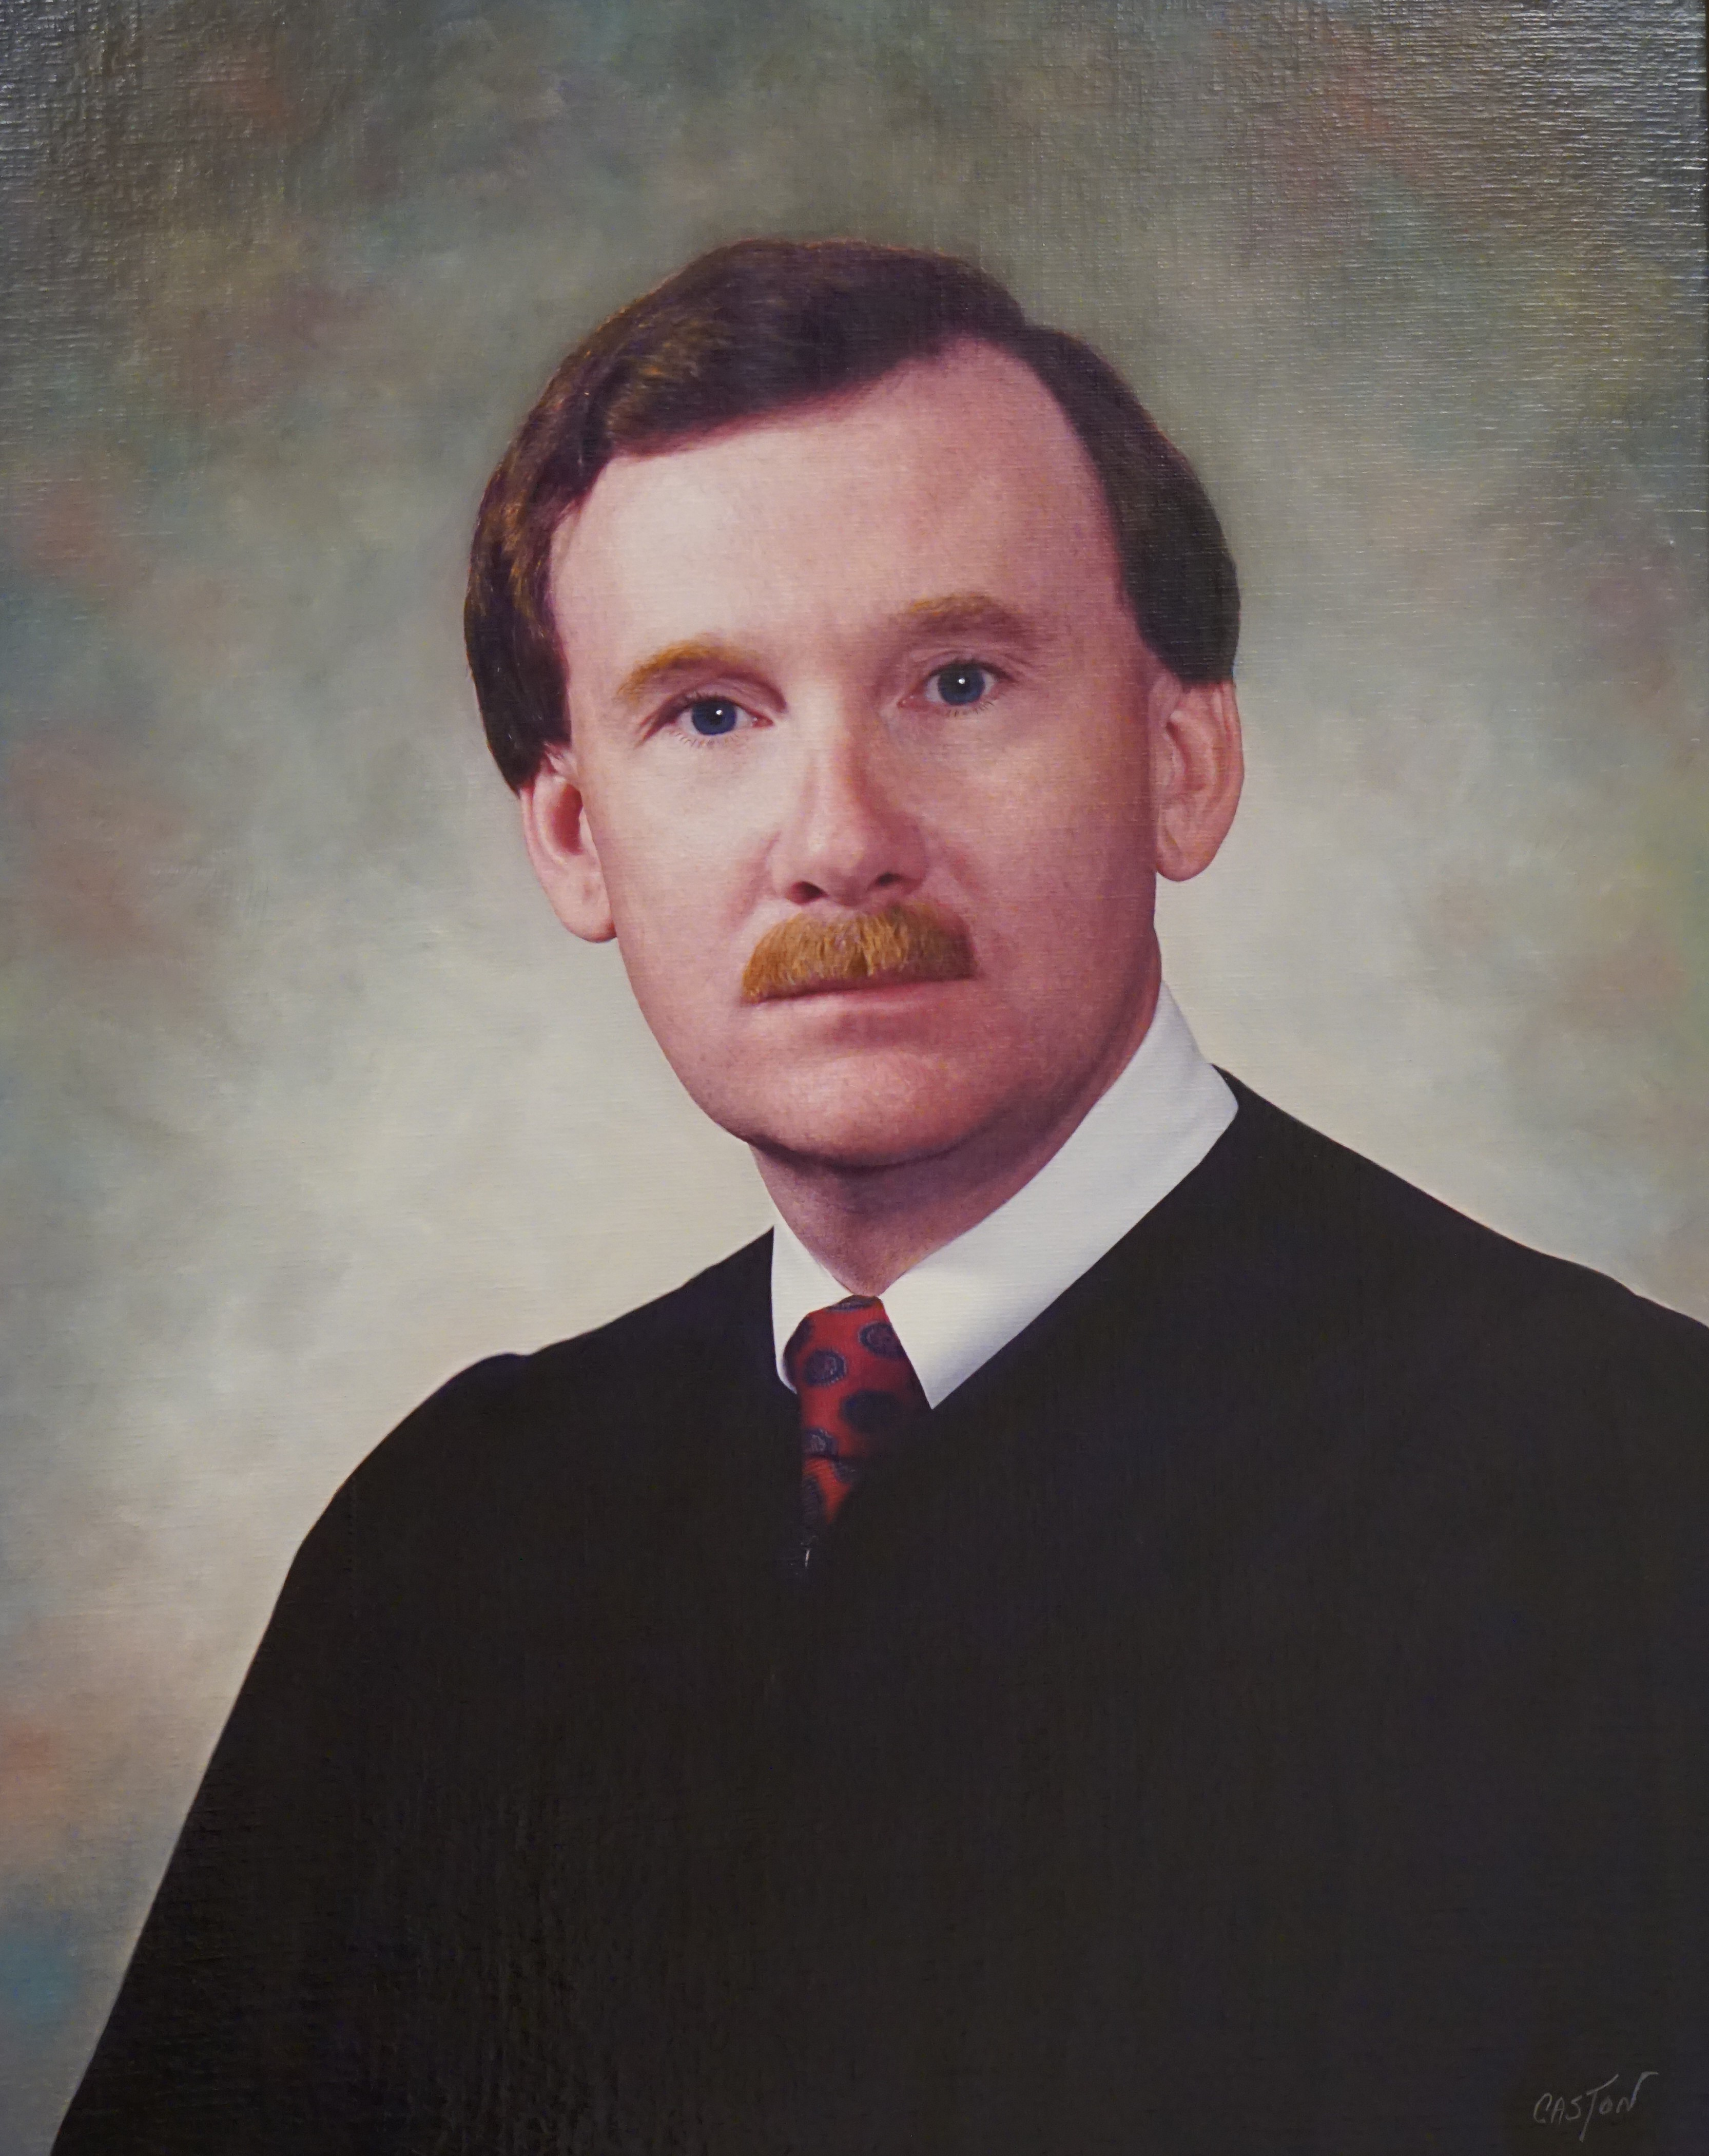 Judge Larry G. Elder